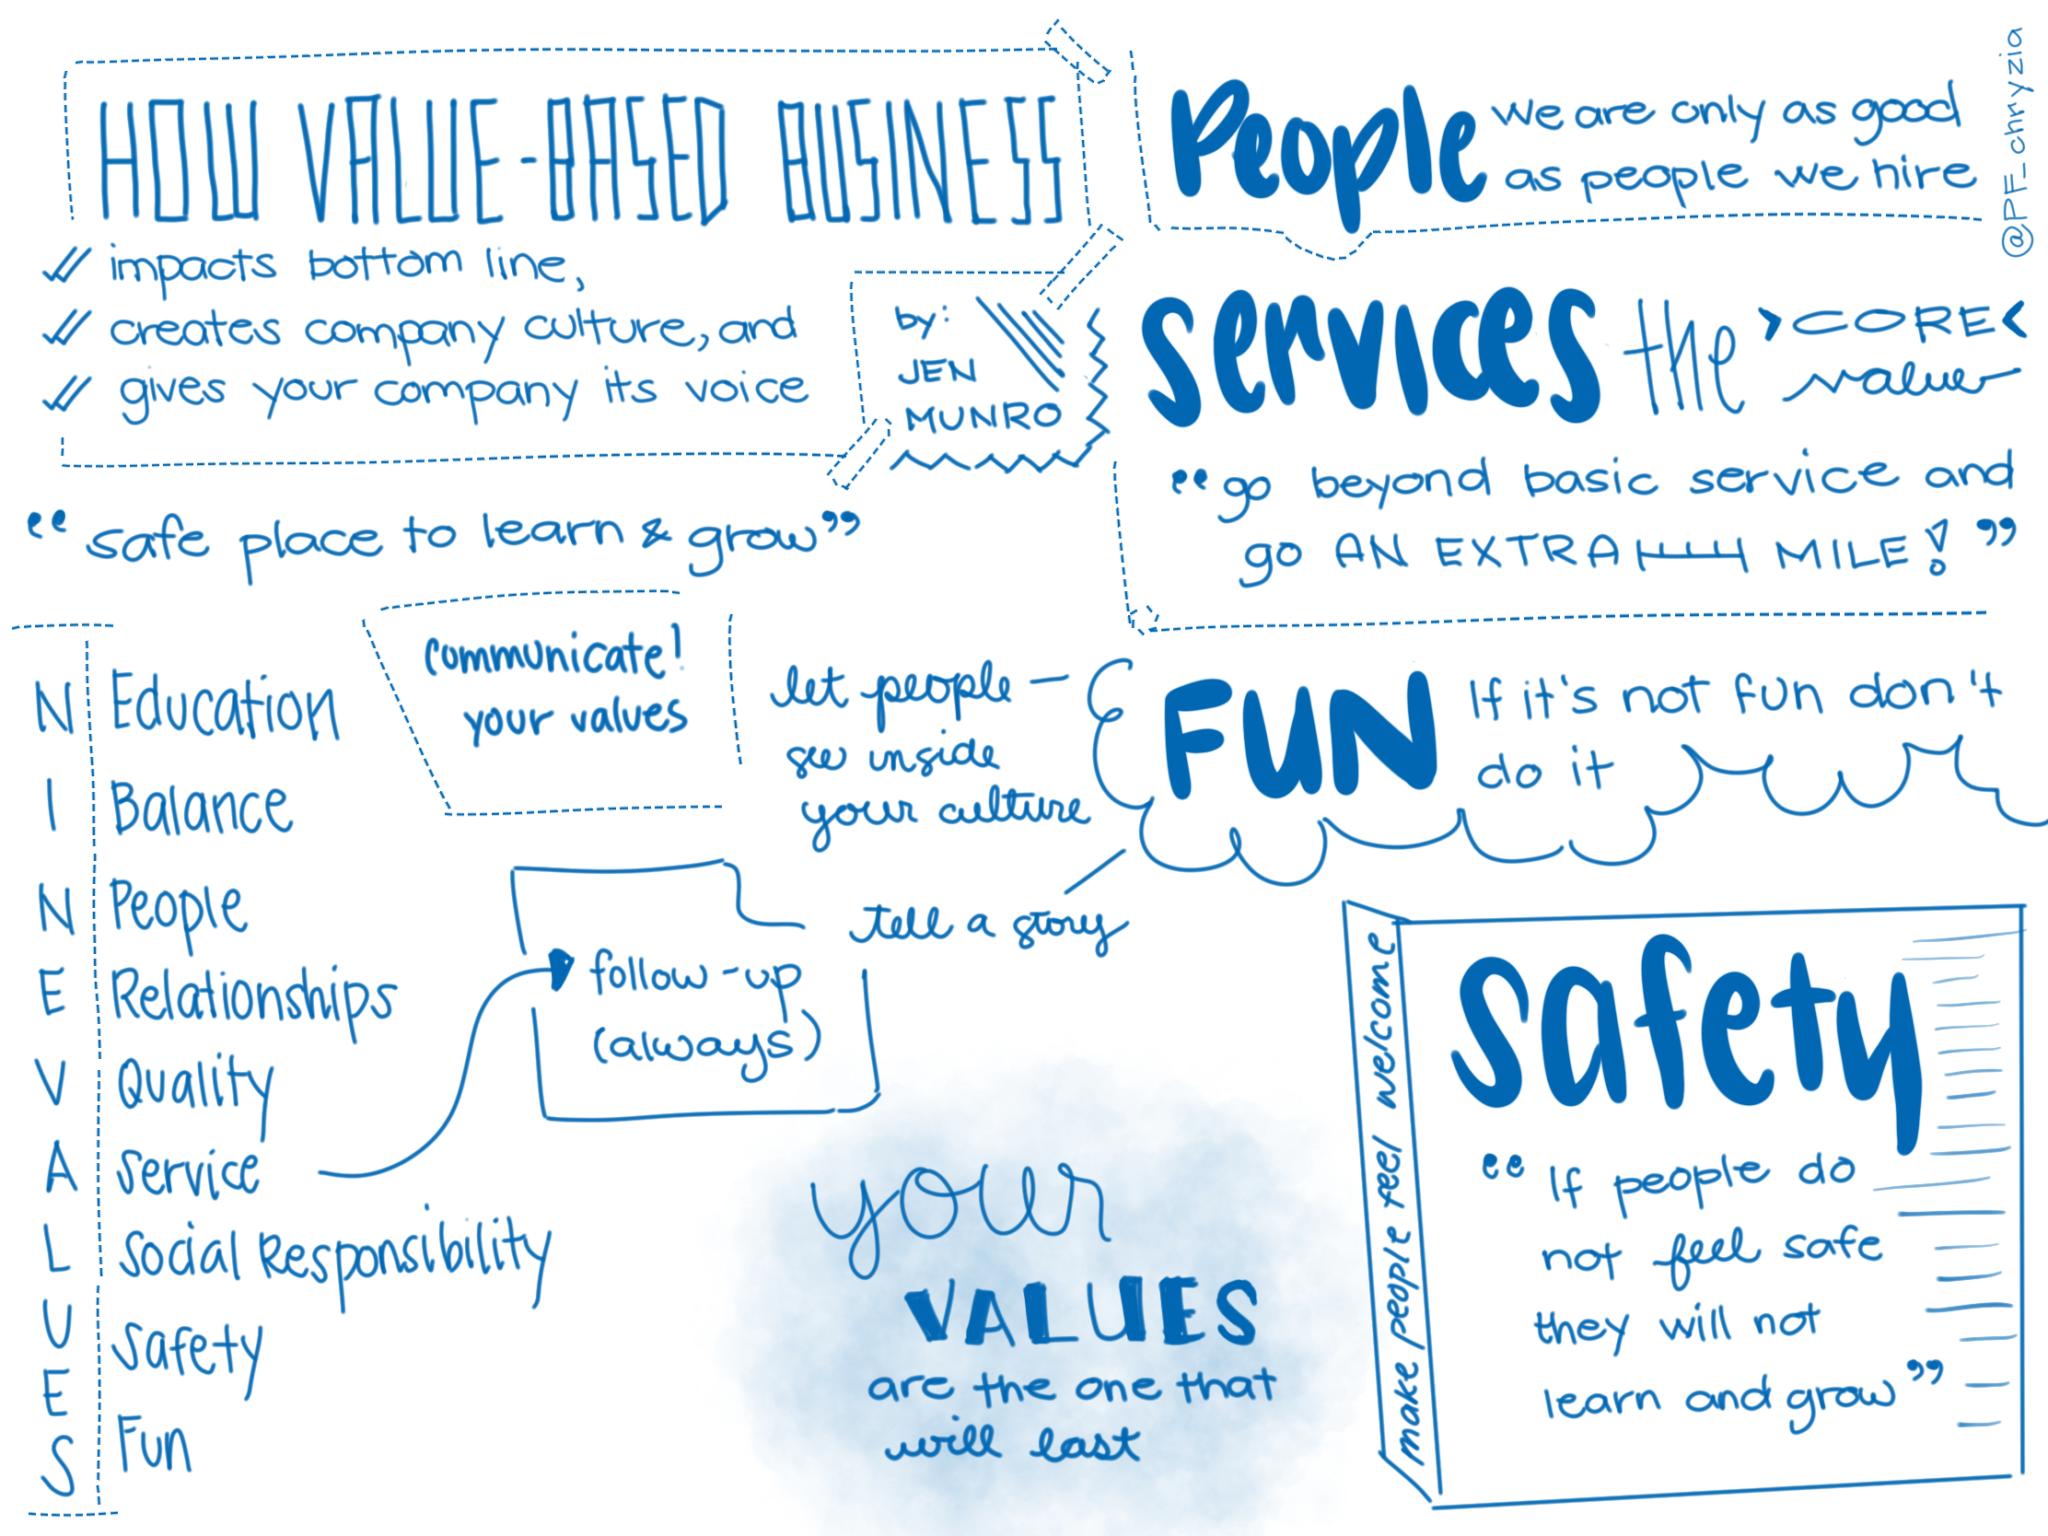 Value Based Business sketch note